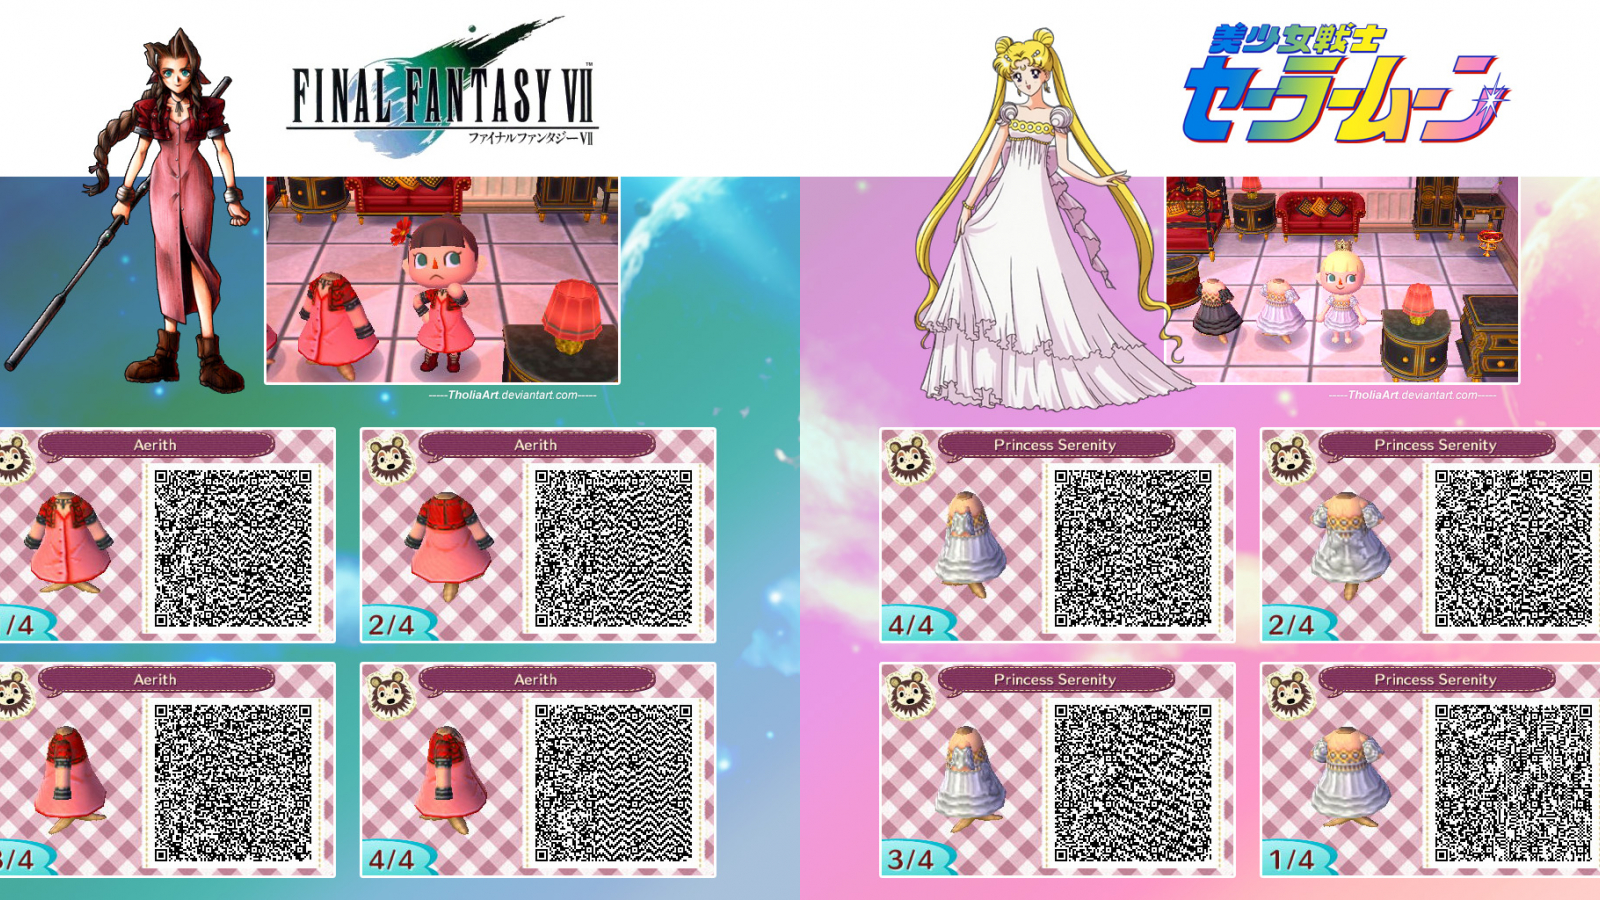 Free Download Animal Crossing Qr Codes Cute Paths Qr Codes For Animal Crossing 2048x1024 For Your Desktop Mobile Tablet Explore 47 Animal Crossing Wallpaper